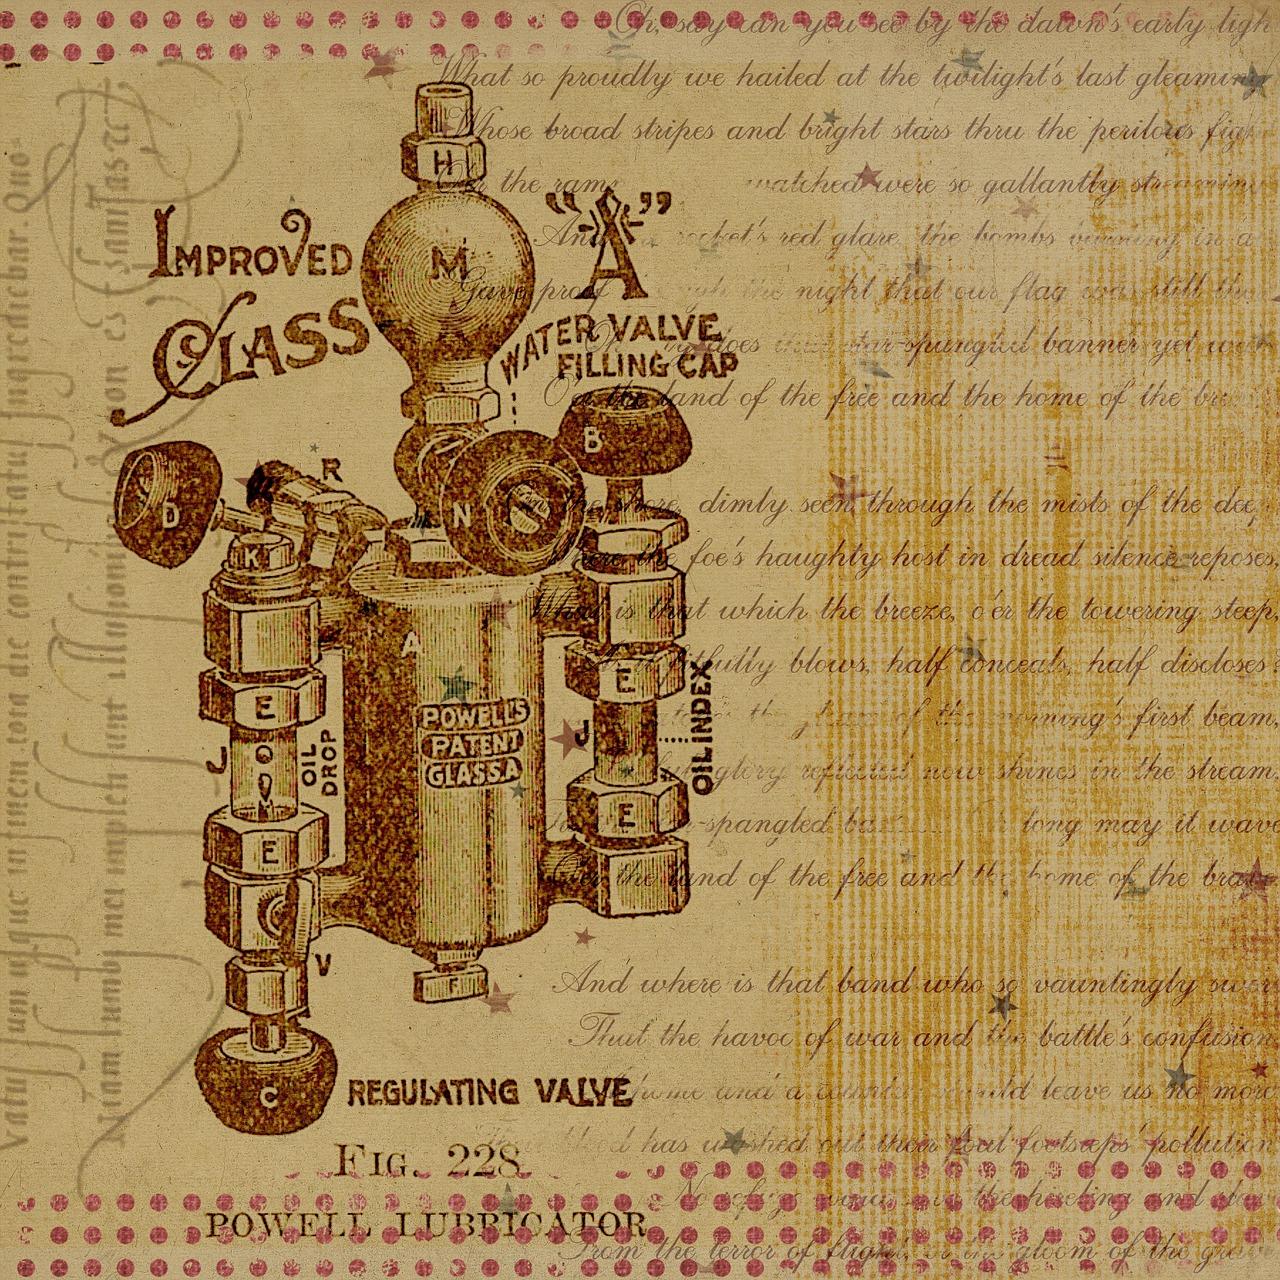 A classic patent; today's patents are far more complex